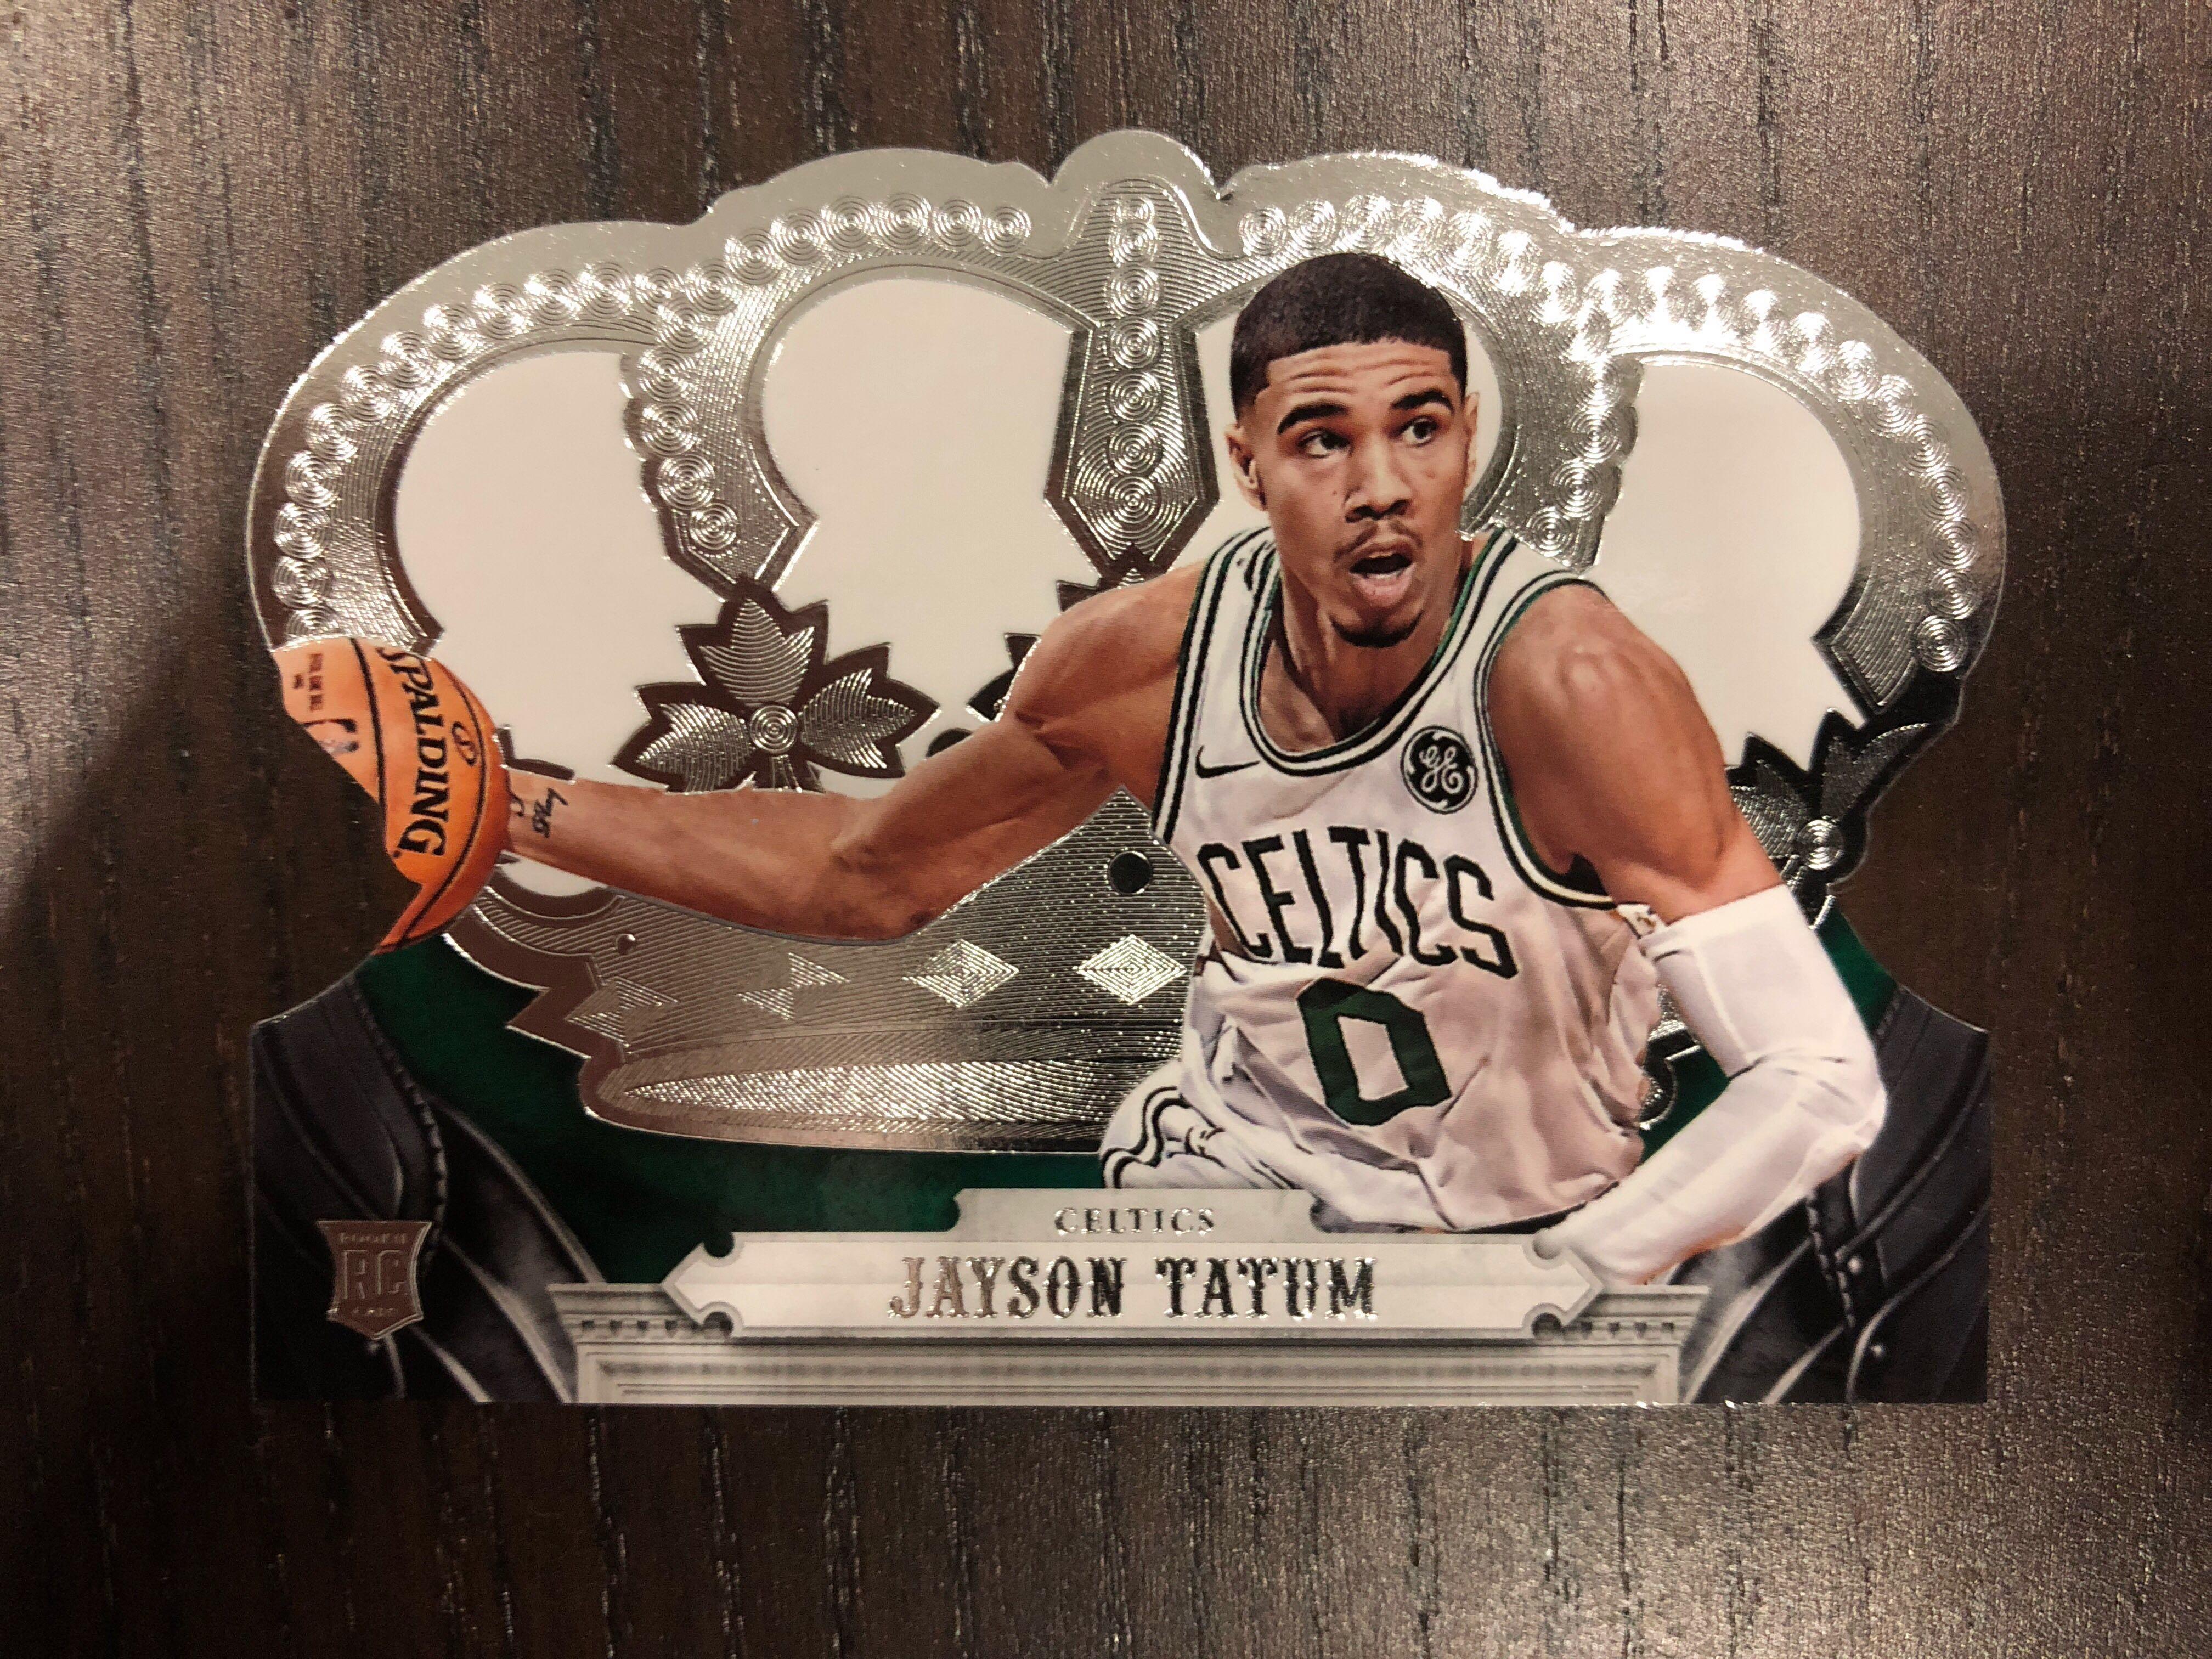 Jayson Tatum 2017 18 Nba Panini Crown Royale Rookie Card